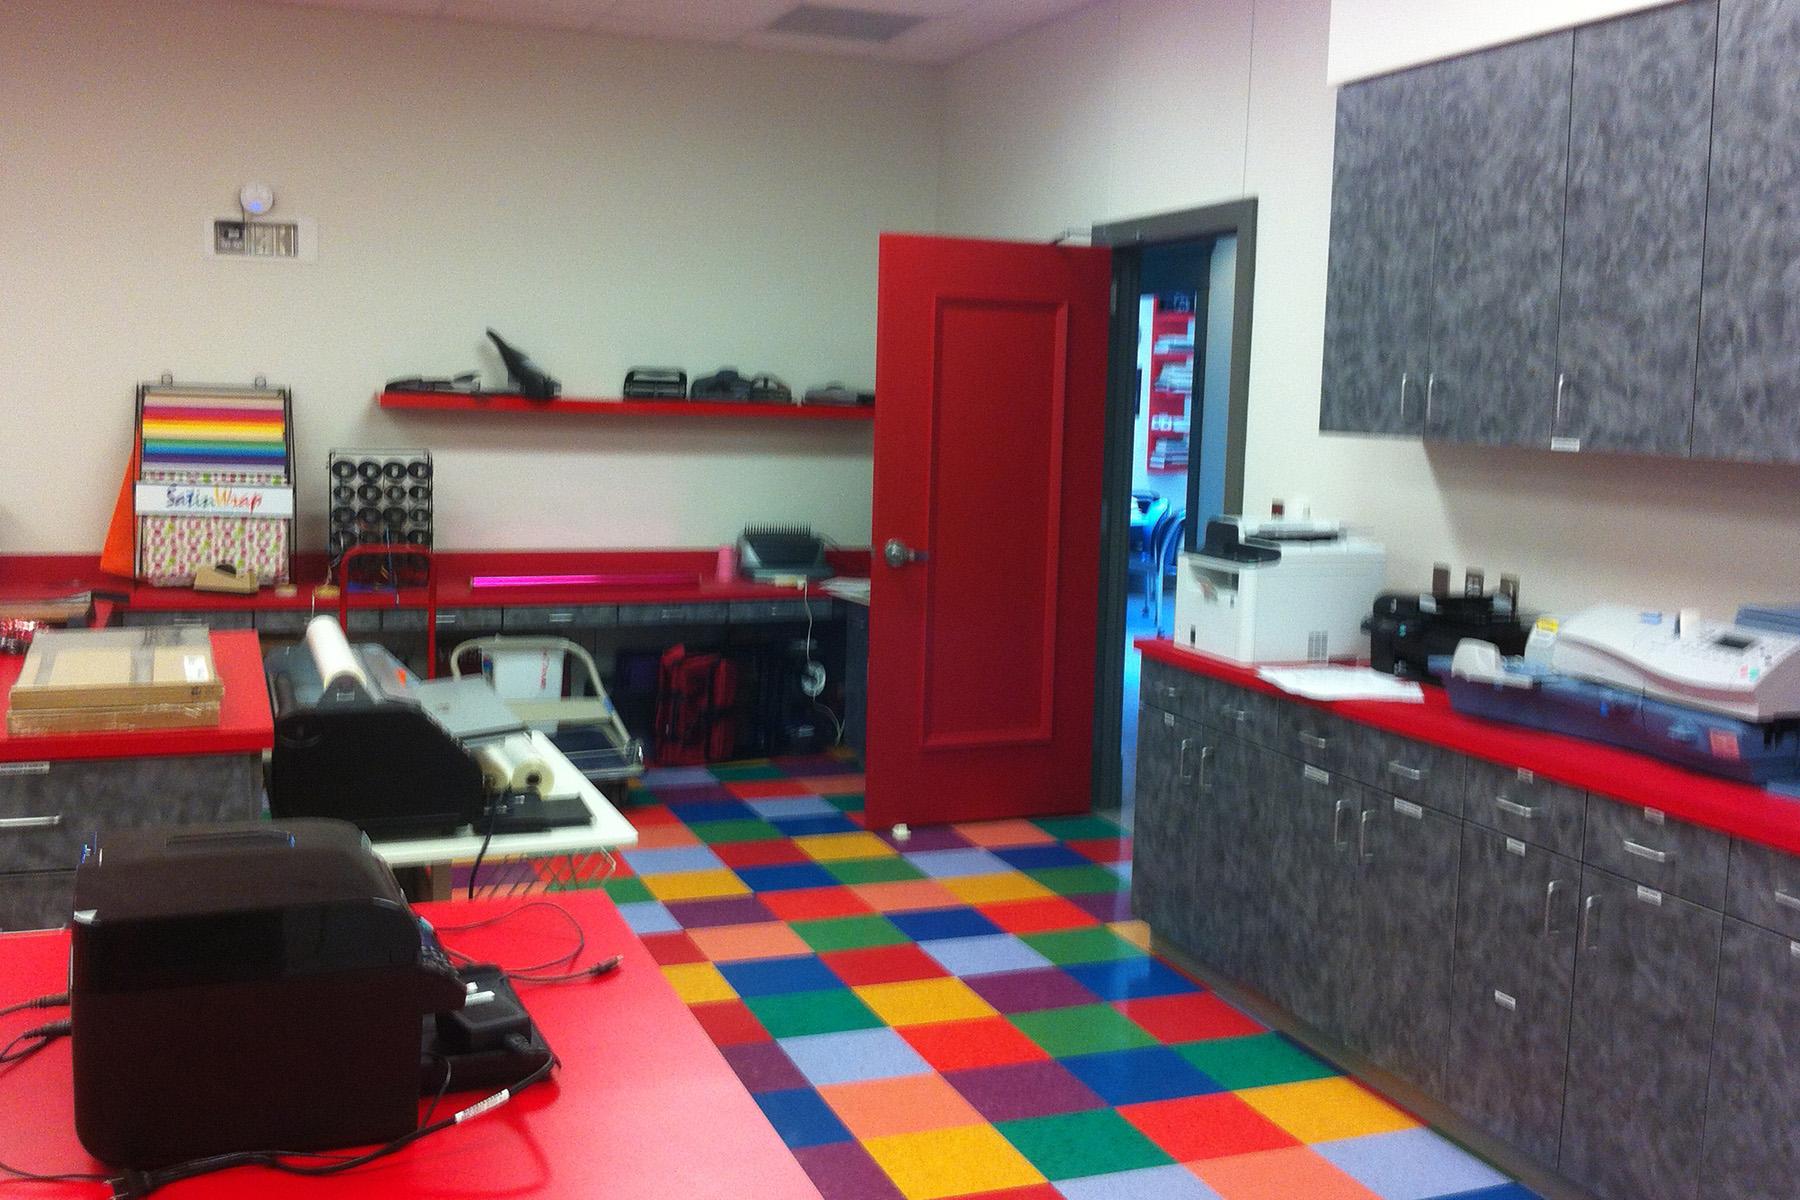 Romper Room - complete!